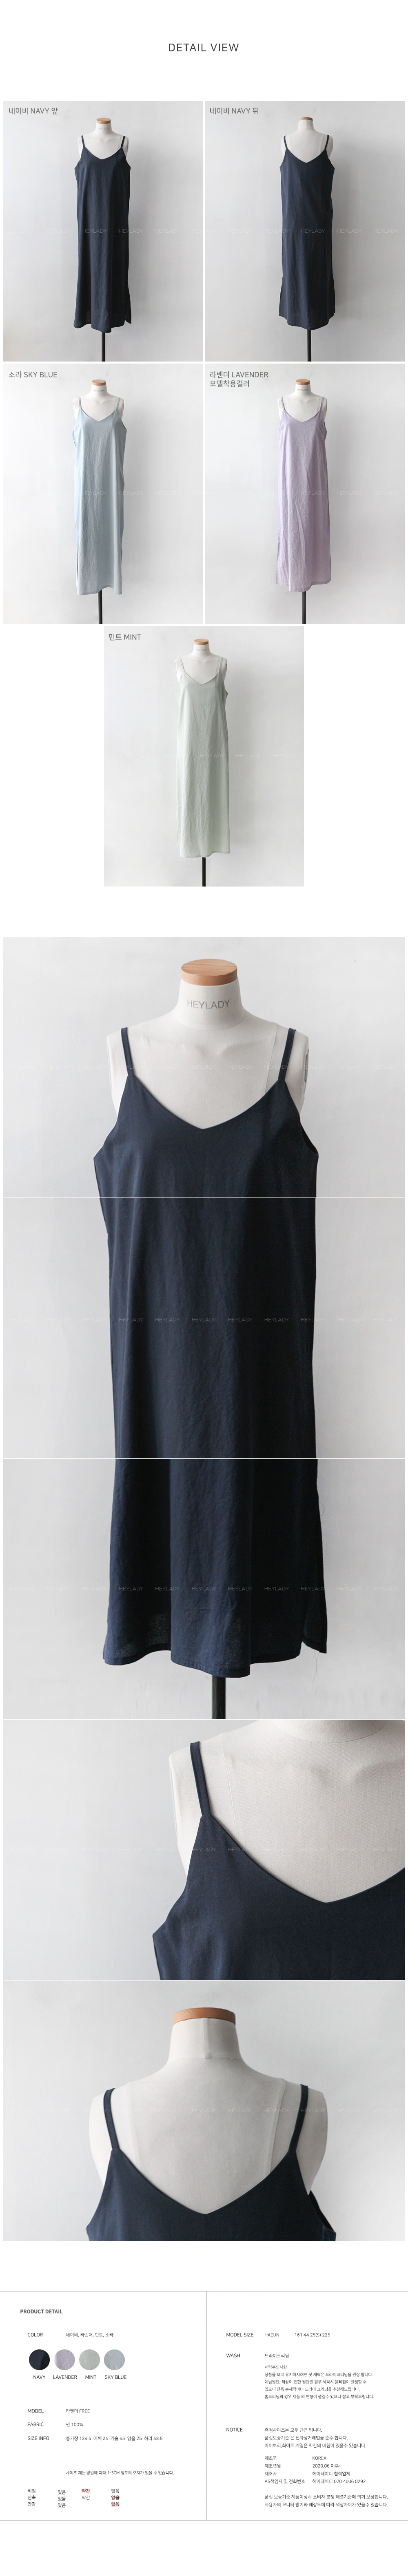 Mania cotton dress